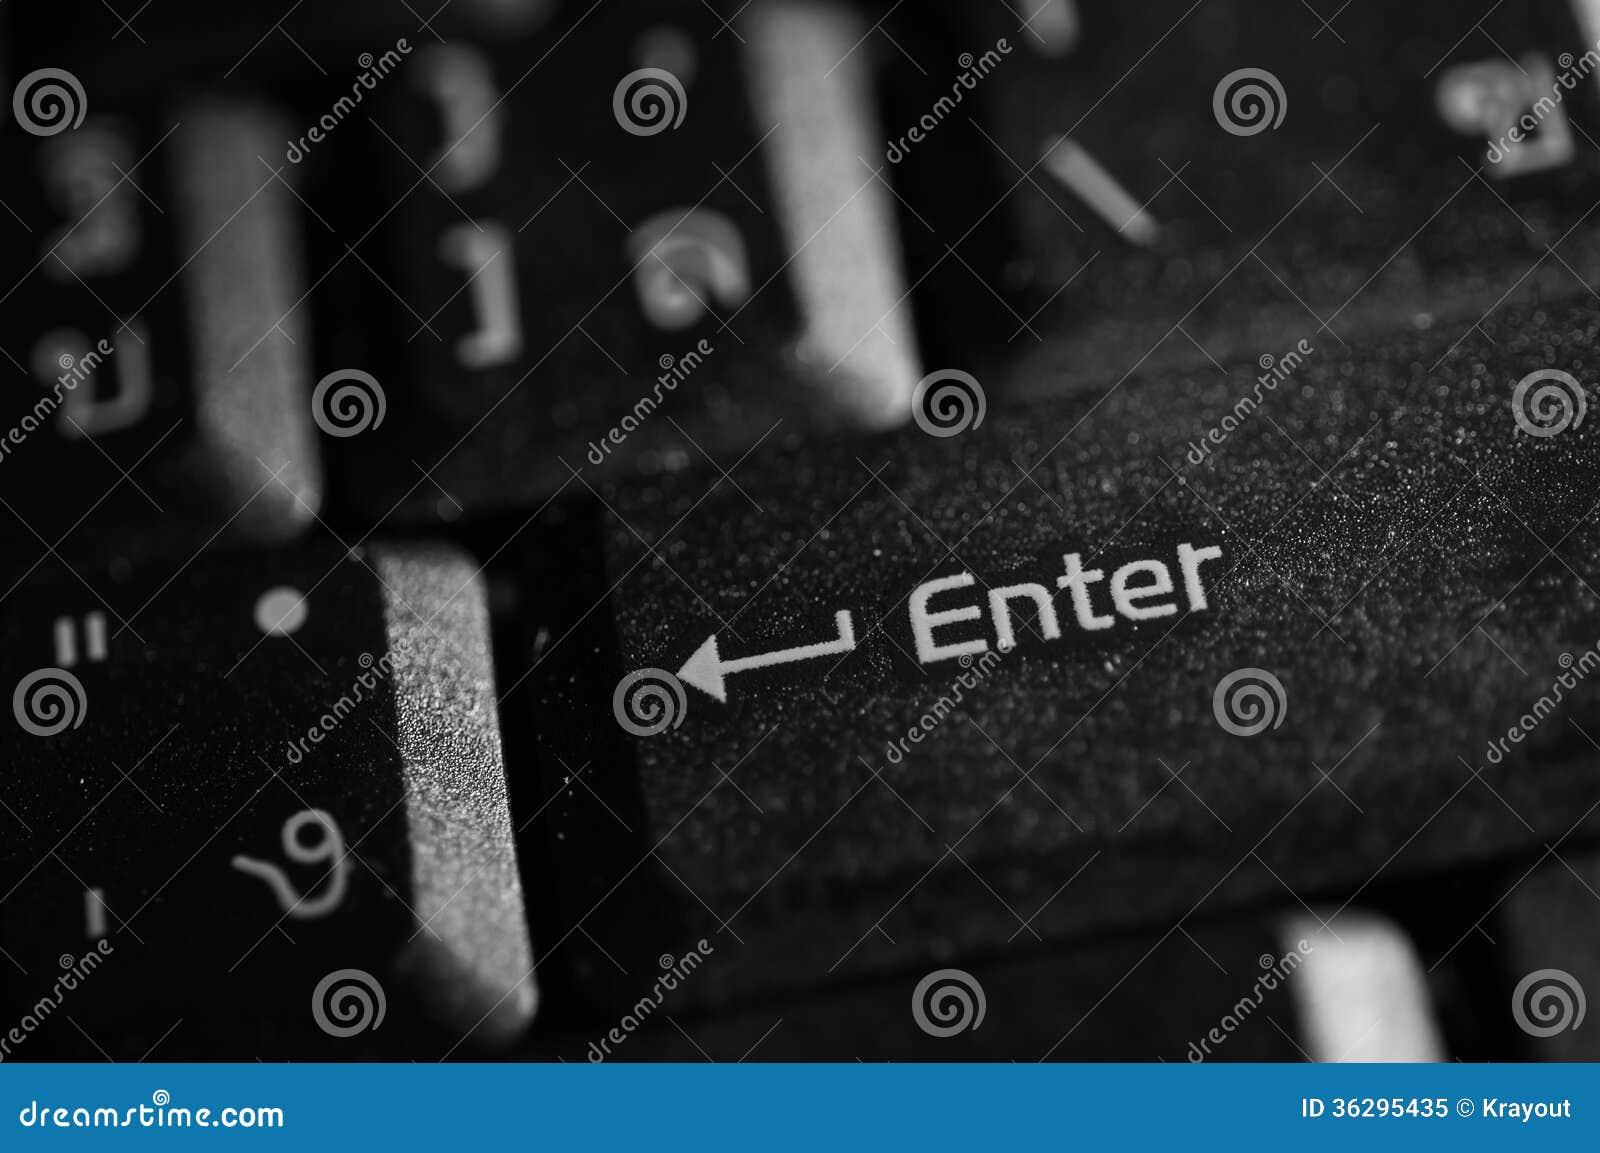 Enter botten